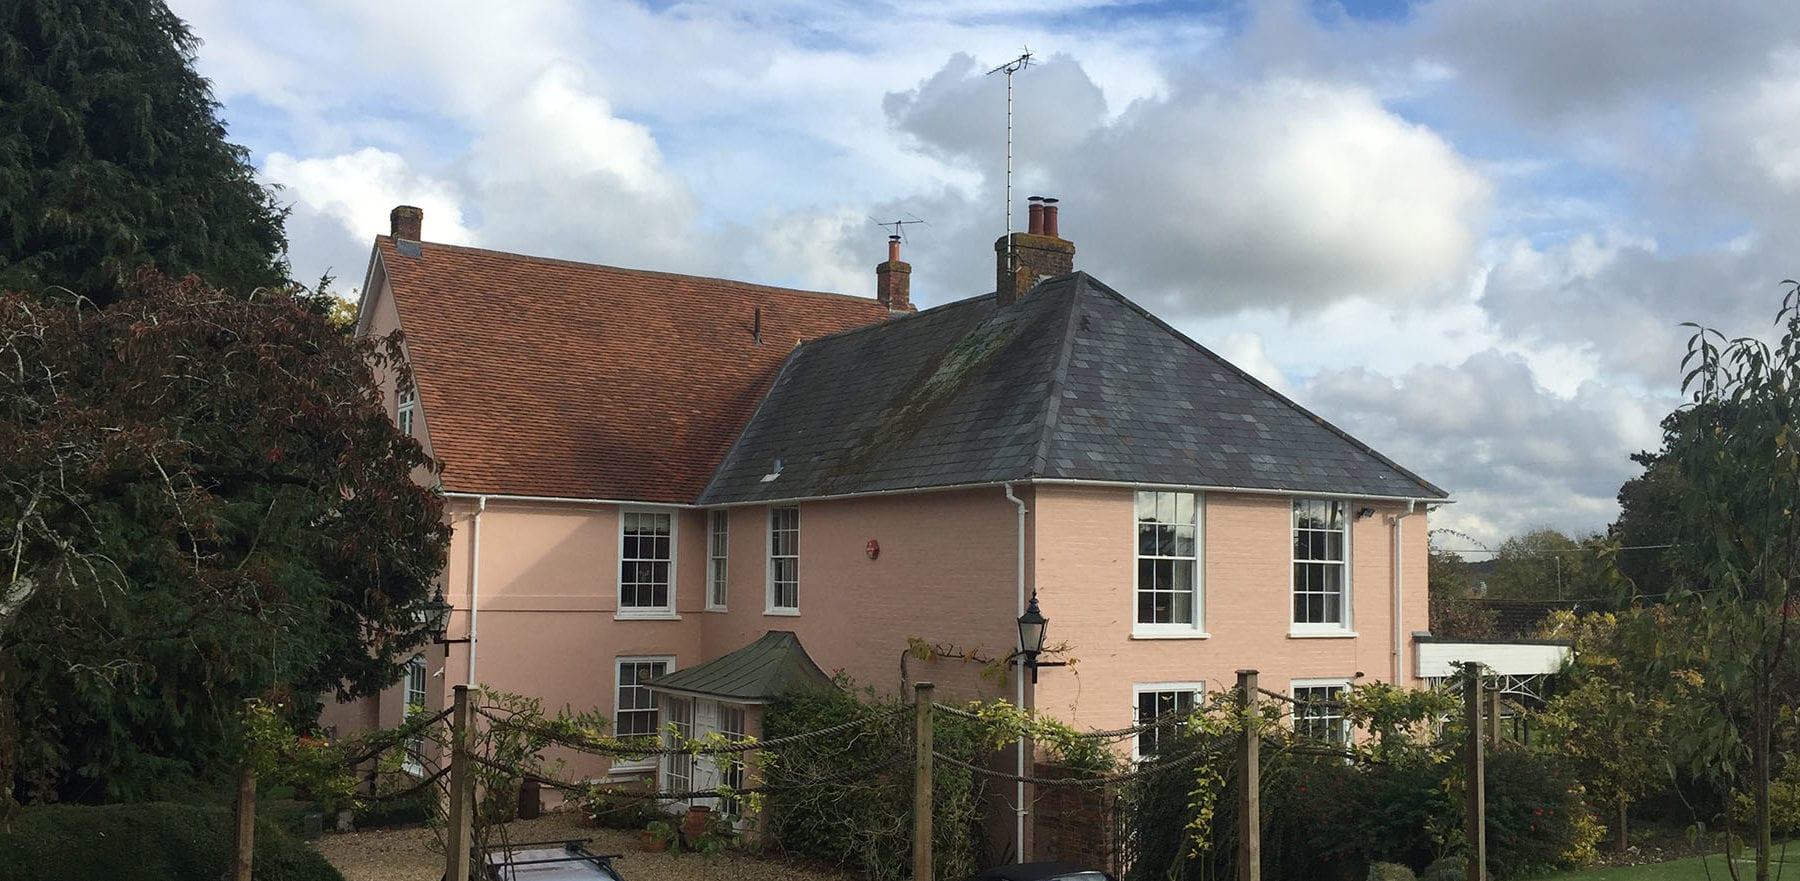 Lifestiles - Handmade Brown Clay Roof Tiles - Stockbridge, England 3